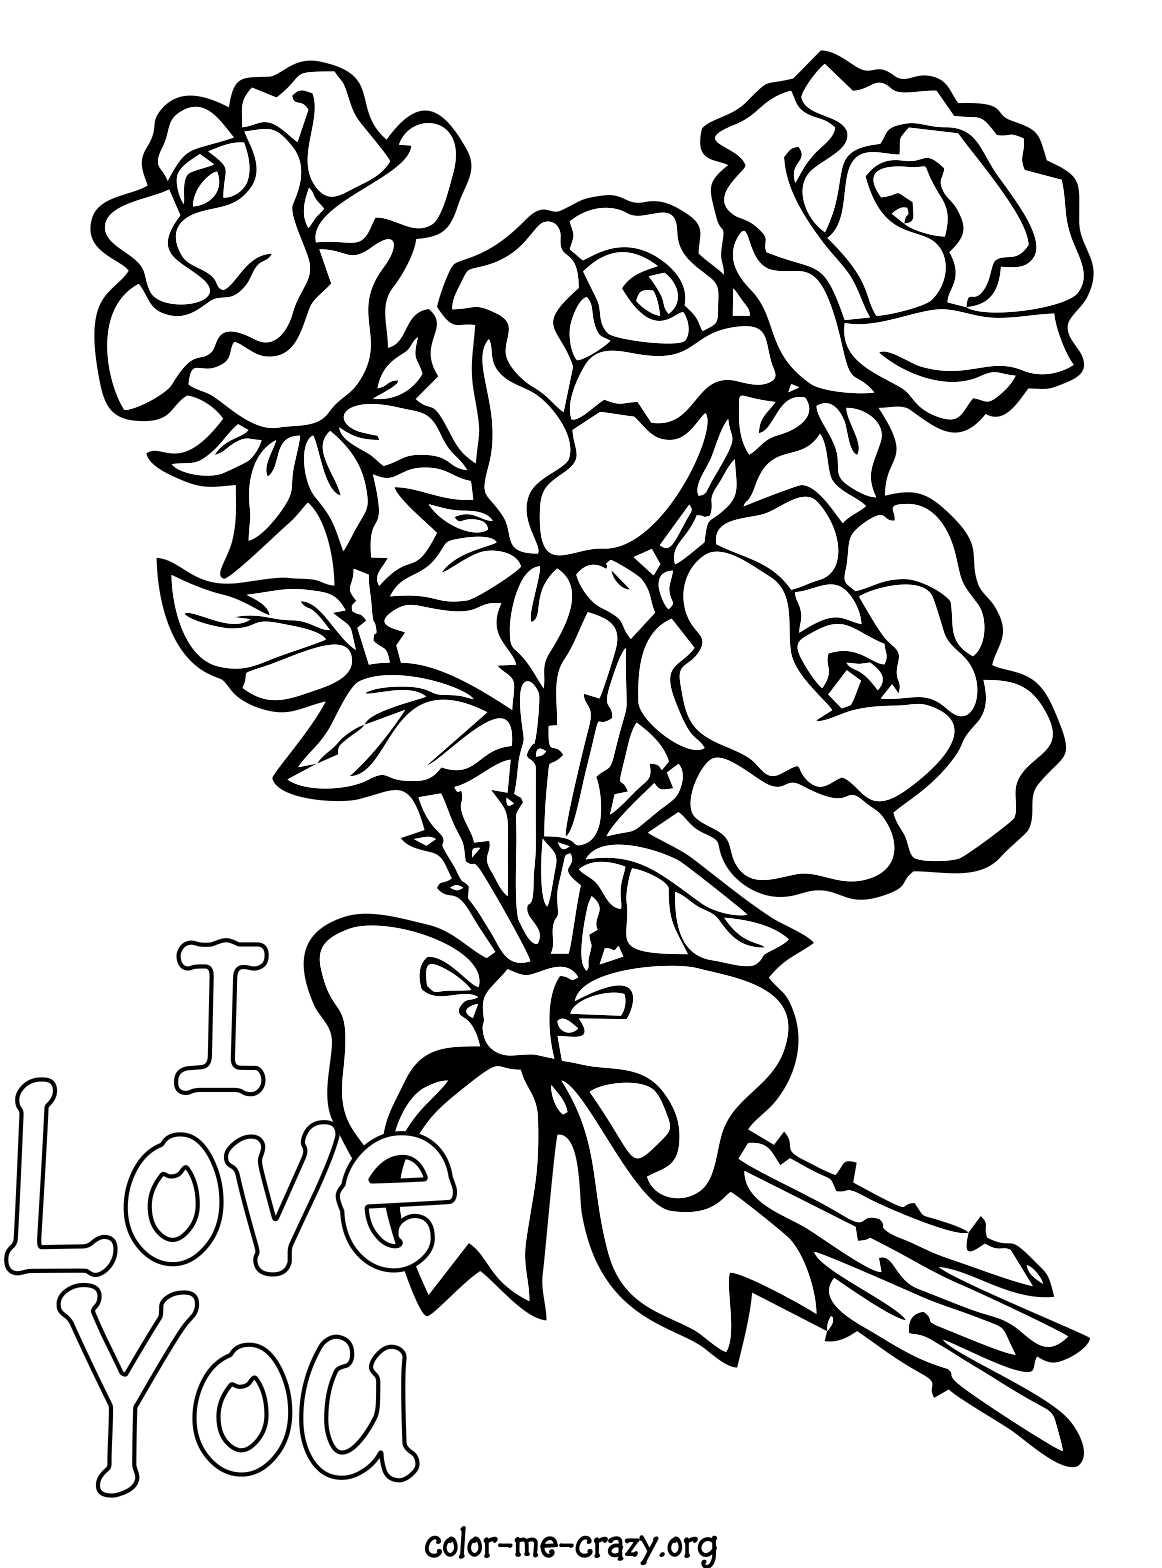 valentines colouring pages colormecrazyorg valentine coloring pages valentines pages colouring